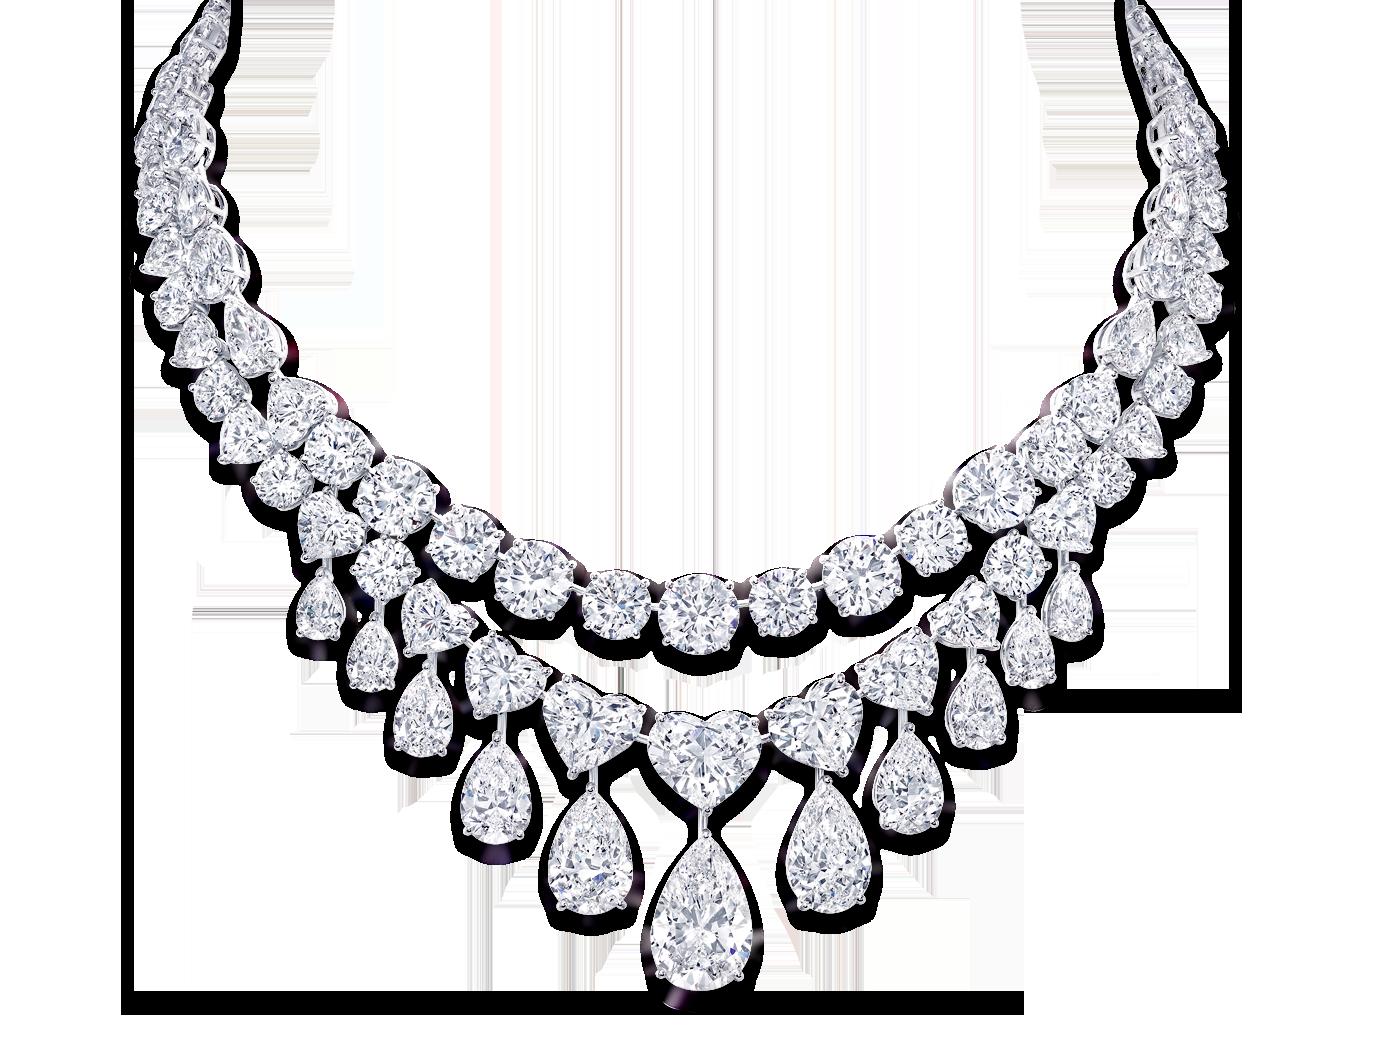 Pin By Nemet Joussef On Jewelry Graff Jewelry Diamond Necklace Designs Diamond Necklace